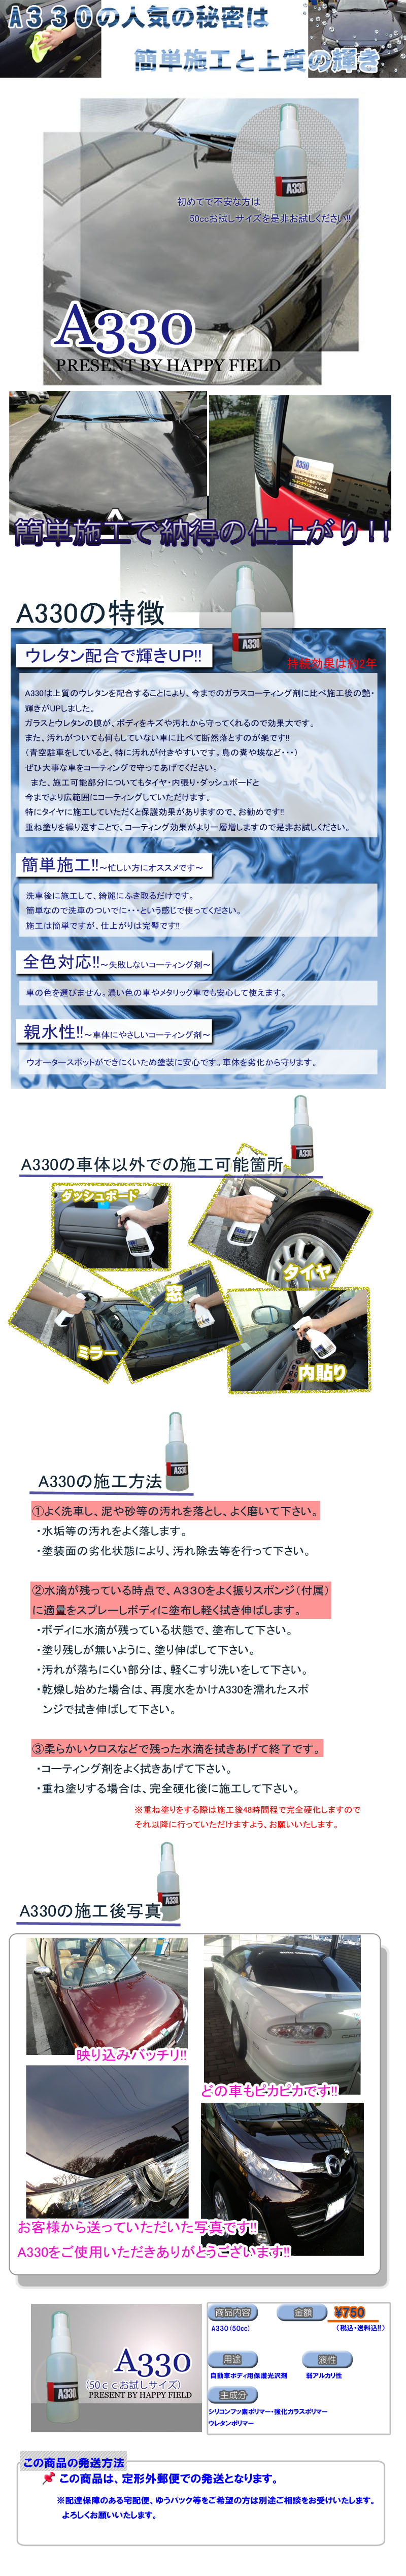 A330 コーティング剤商品説明